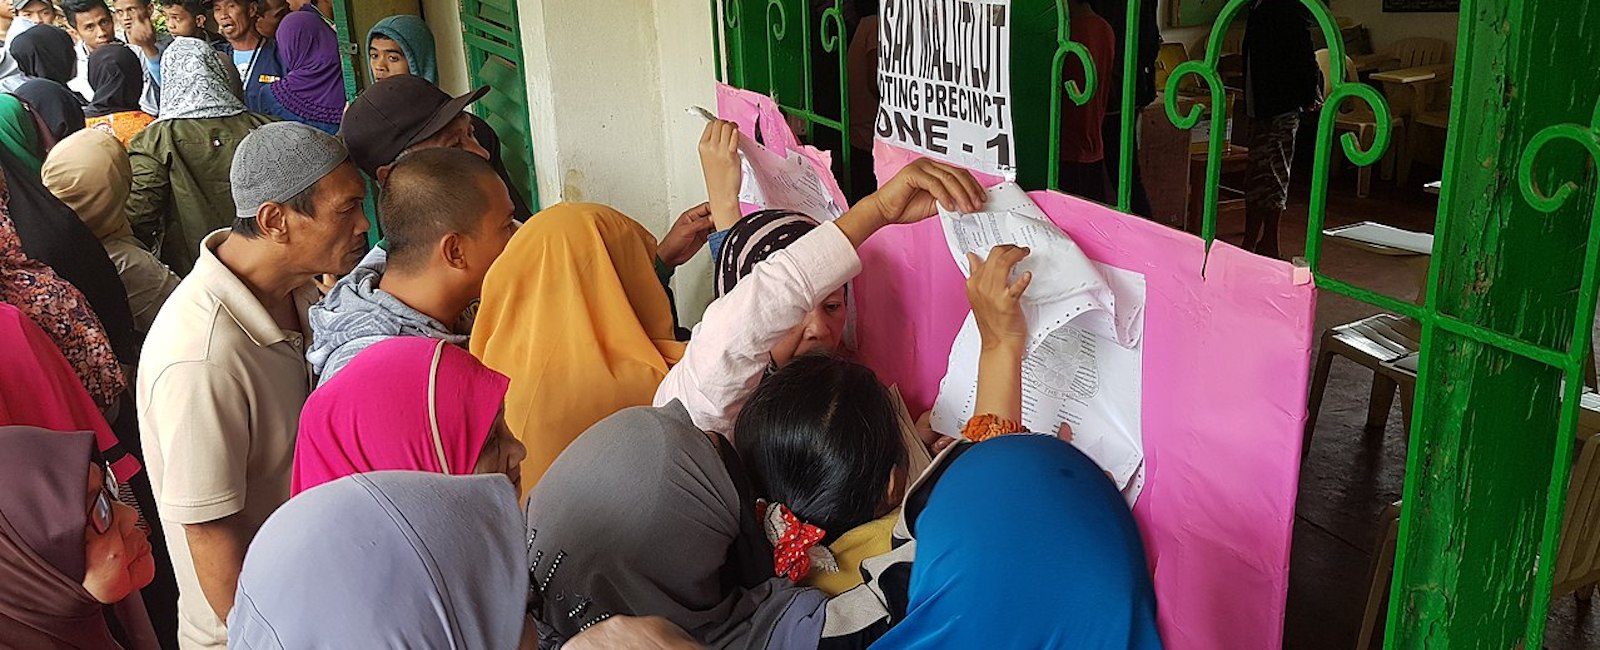 Voters at the Bangsamoro Organic Law plebiscite on January 21 (Photo: Wikimedia Commons)